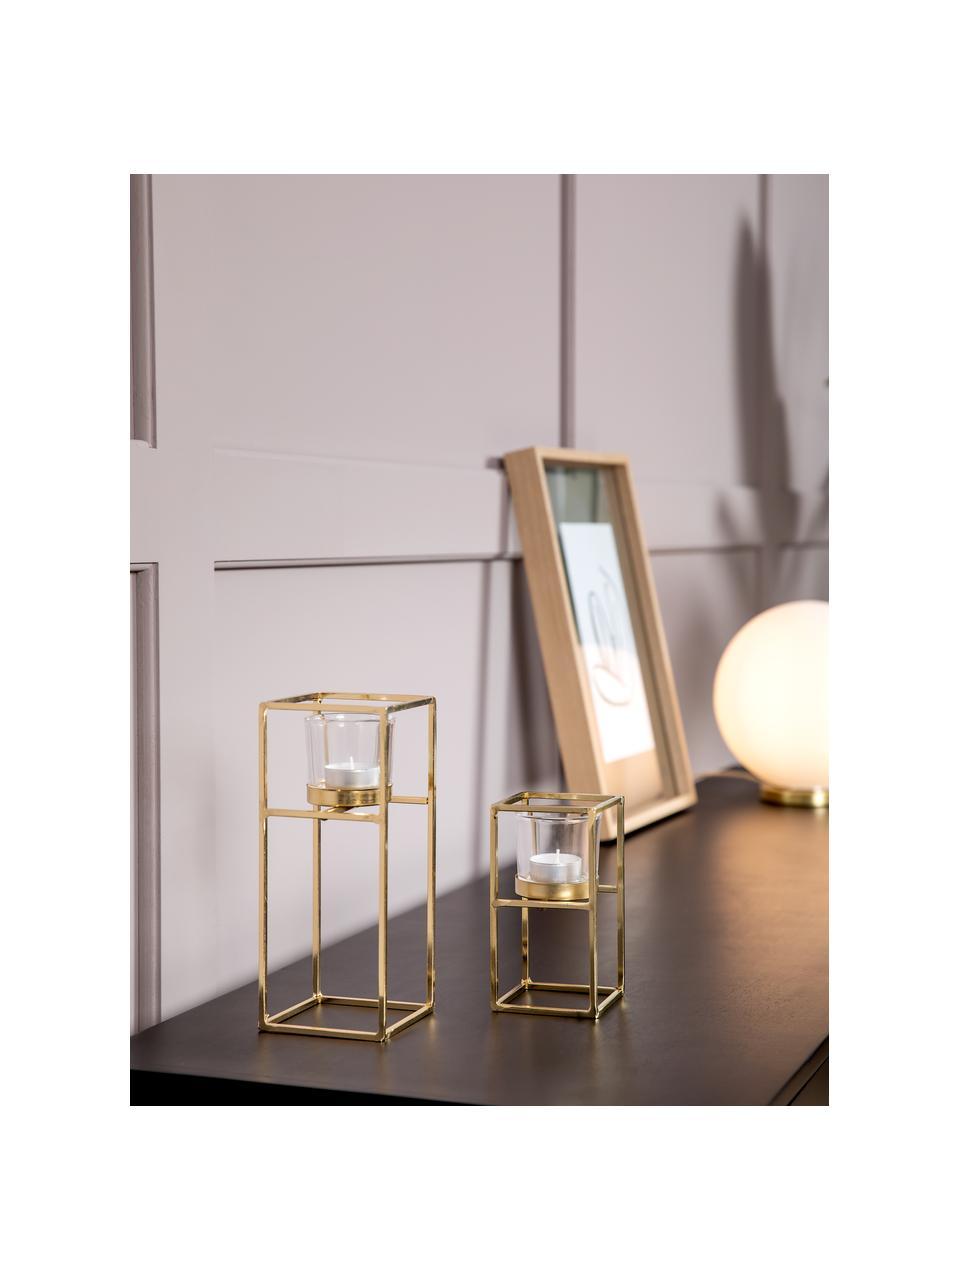 Set 2 portalumini dorati Tonia, Portacandela: vetro, Struttura: metallo rivestito, Trasparente, ottonato, Set in varie misure